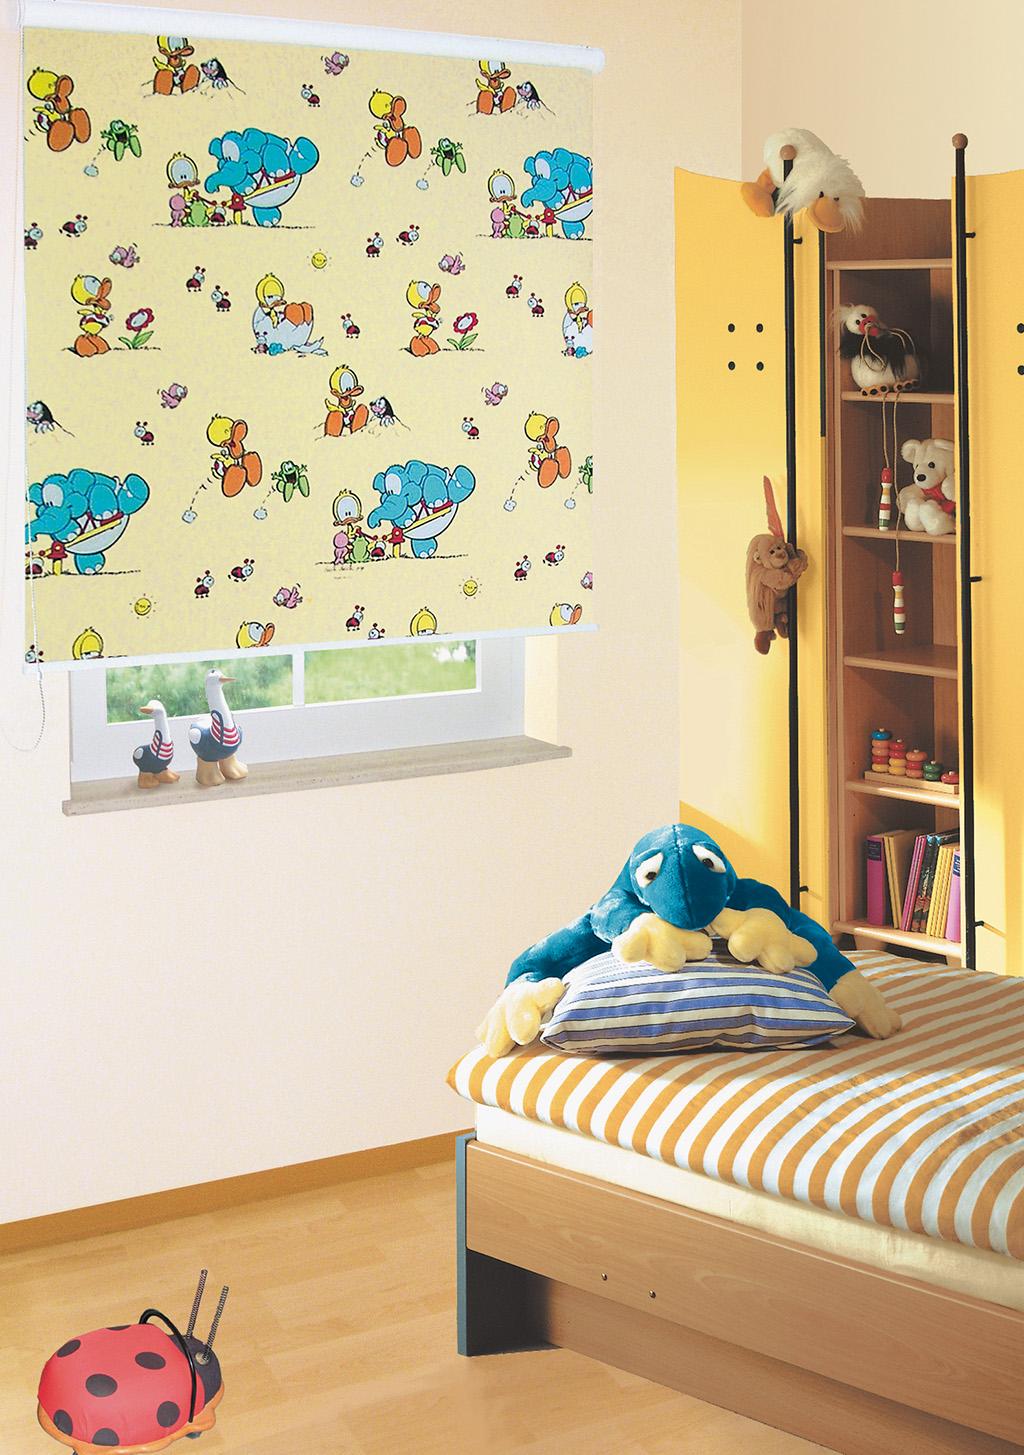 Full Size of Download Indoo Haus Design Sofa Kinderzimmer Regale Regal Weiß Kinderzimmer Verdunkelungsrollo Kinderzimmer